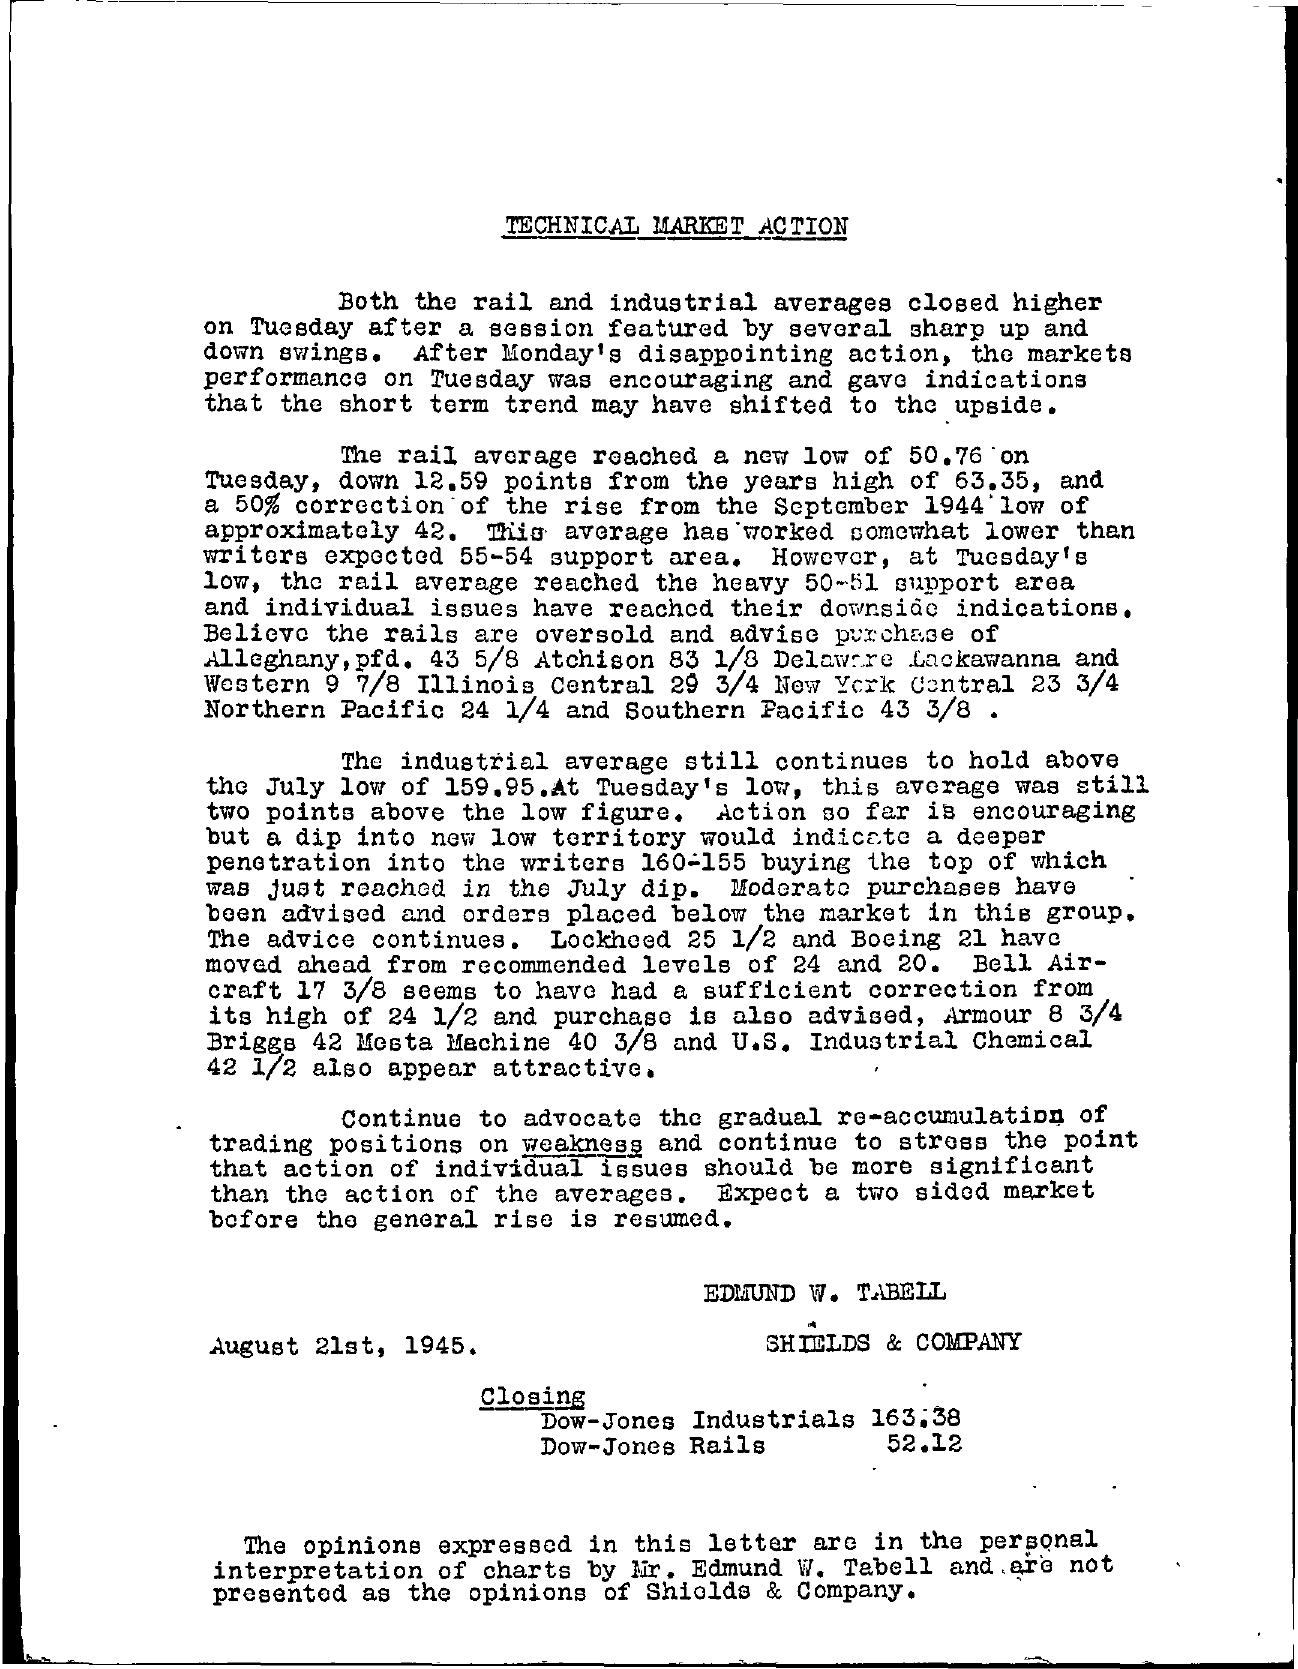 Tabell's Market Letter - August 21, 1945